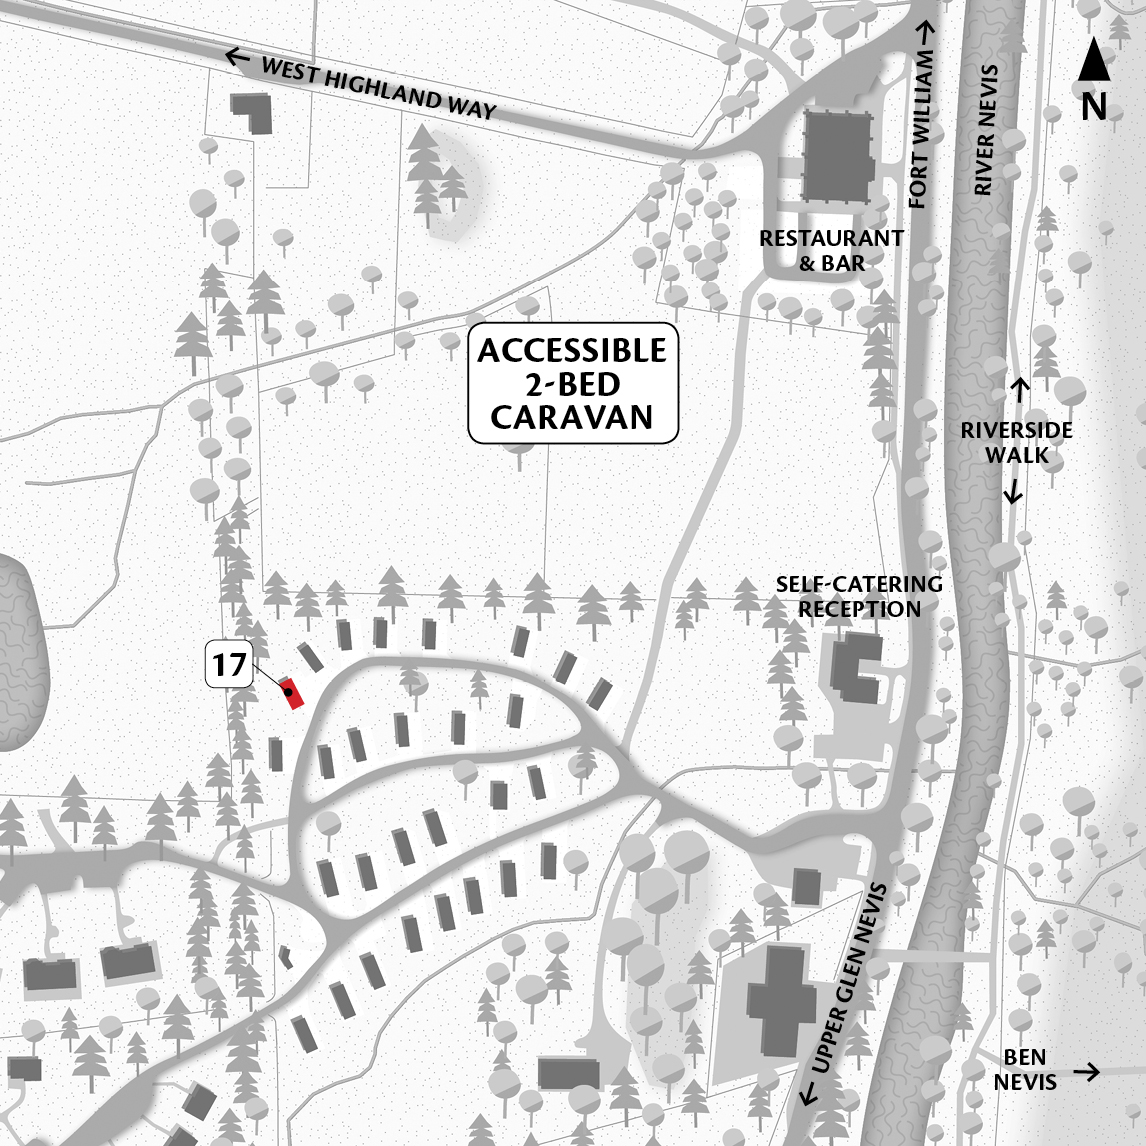 GNH-Map-SelfCatering-WebUnits-Caravan-Accessible2Bed.jpg